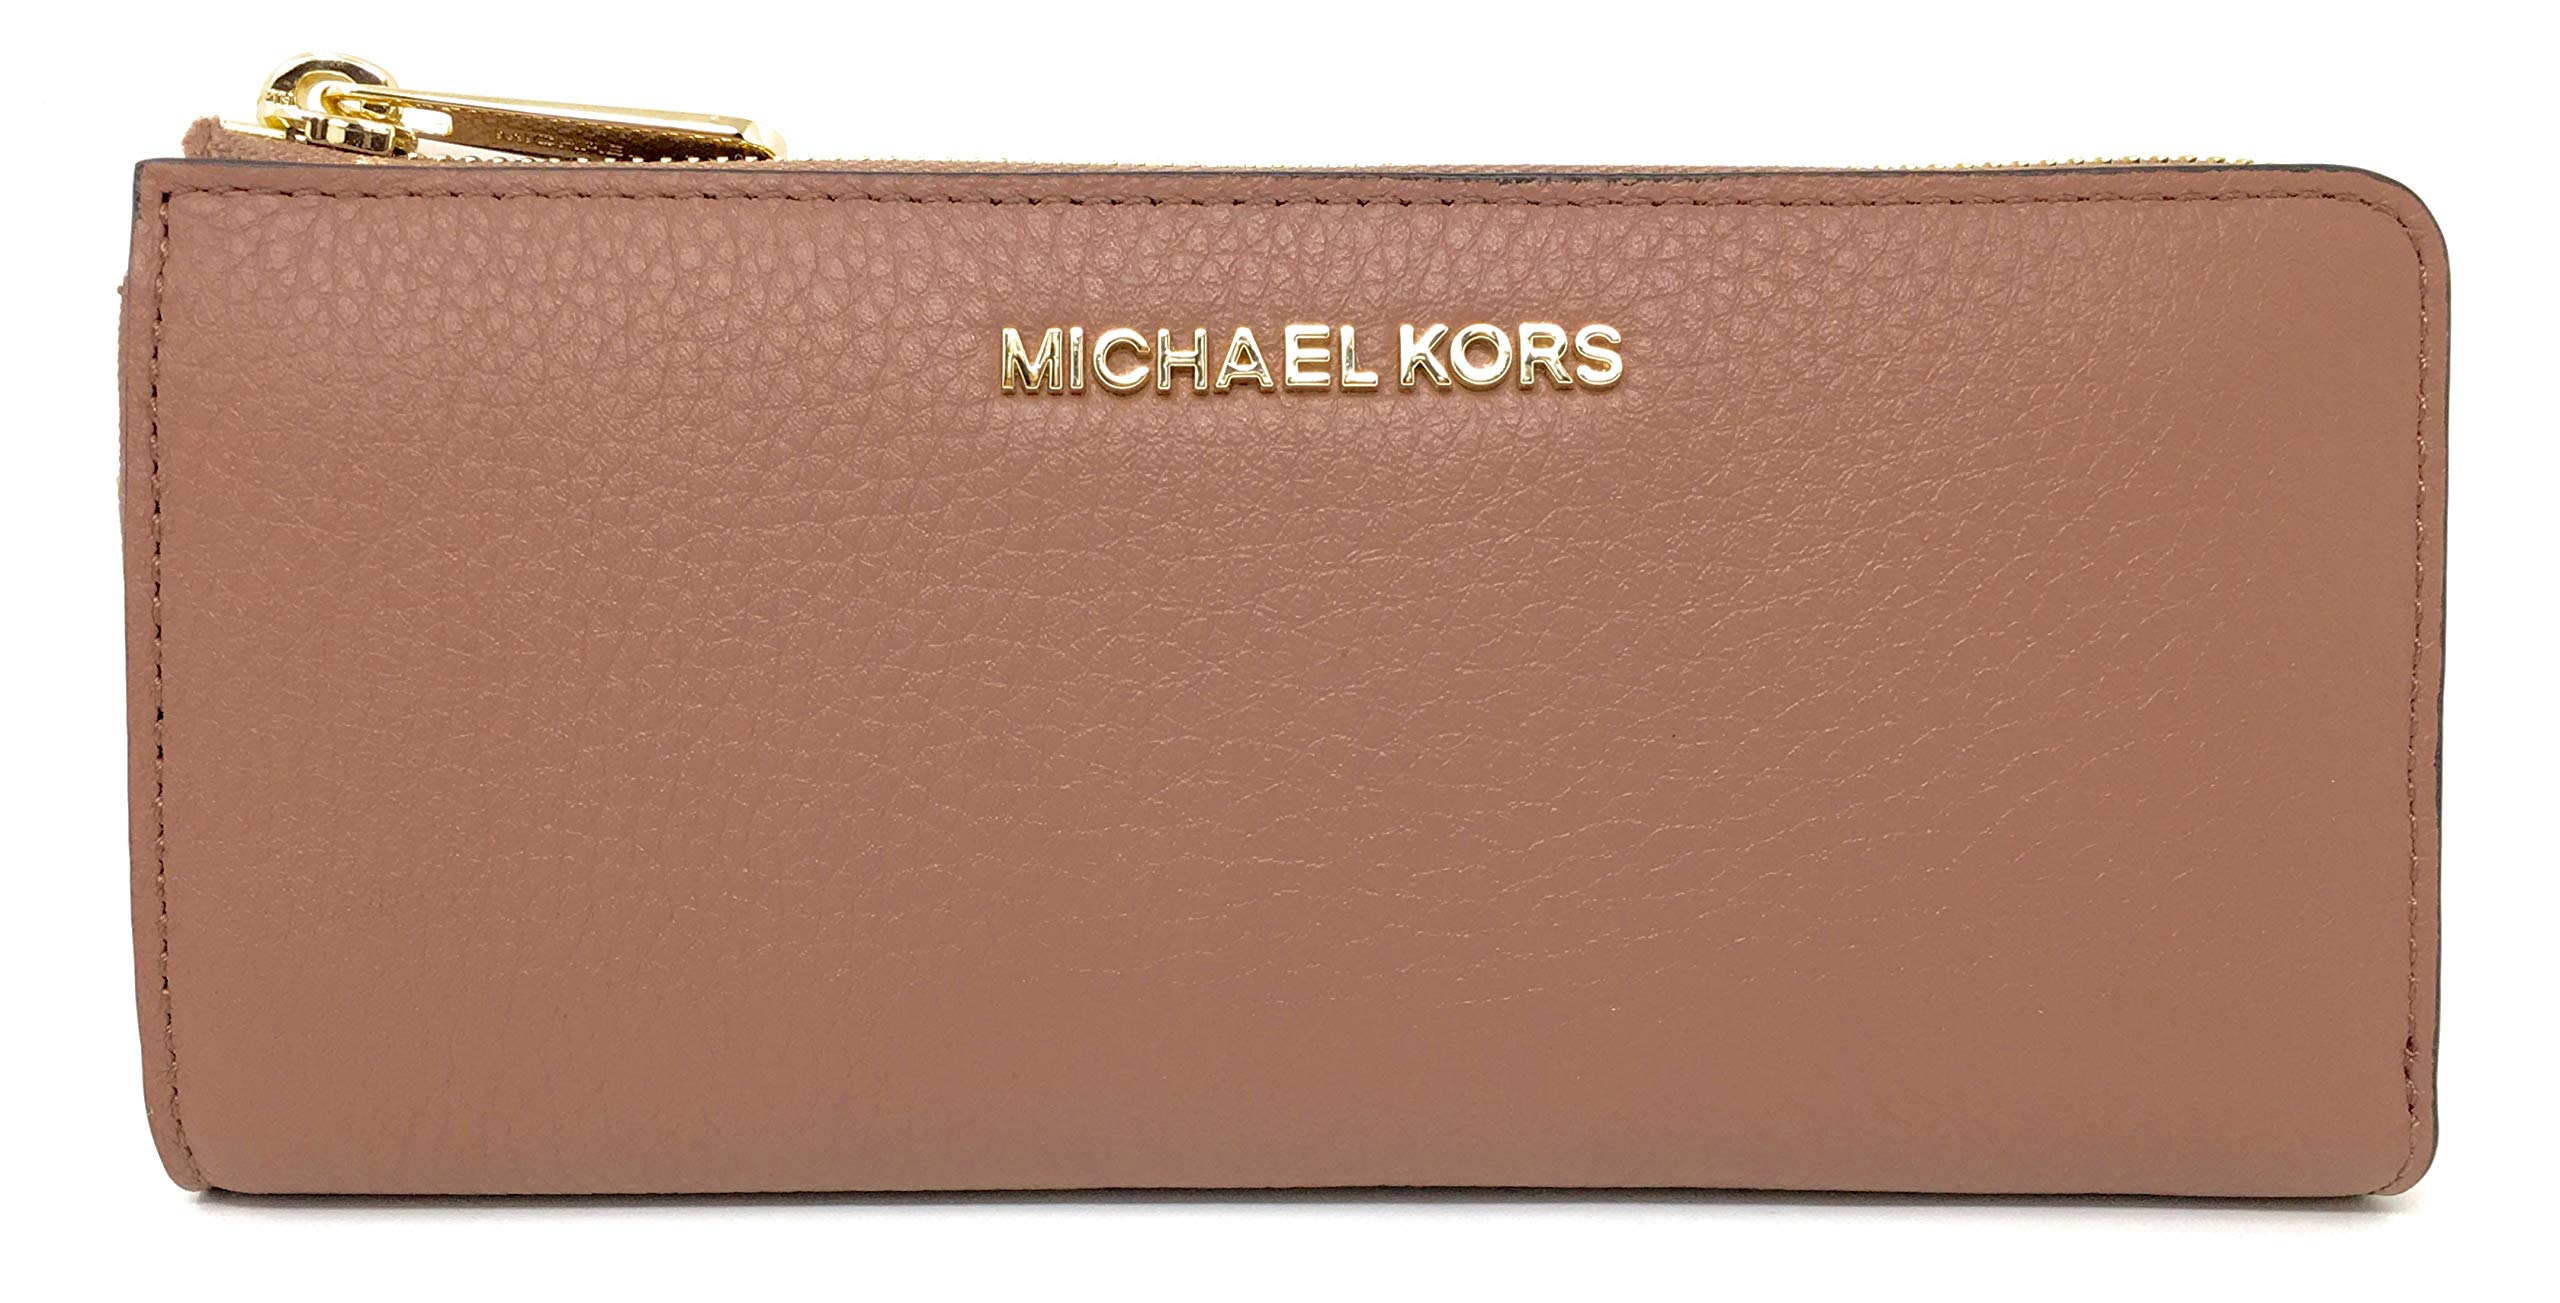 Michael Kors Jet Set Large Three Quarter Zip Around Pebbled Leather Wallet (Dusty Rose)